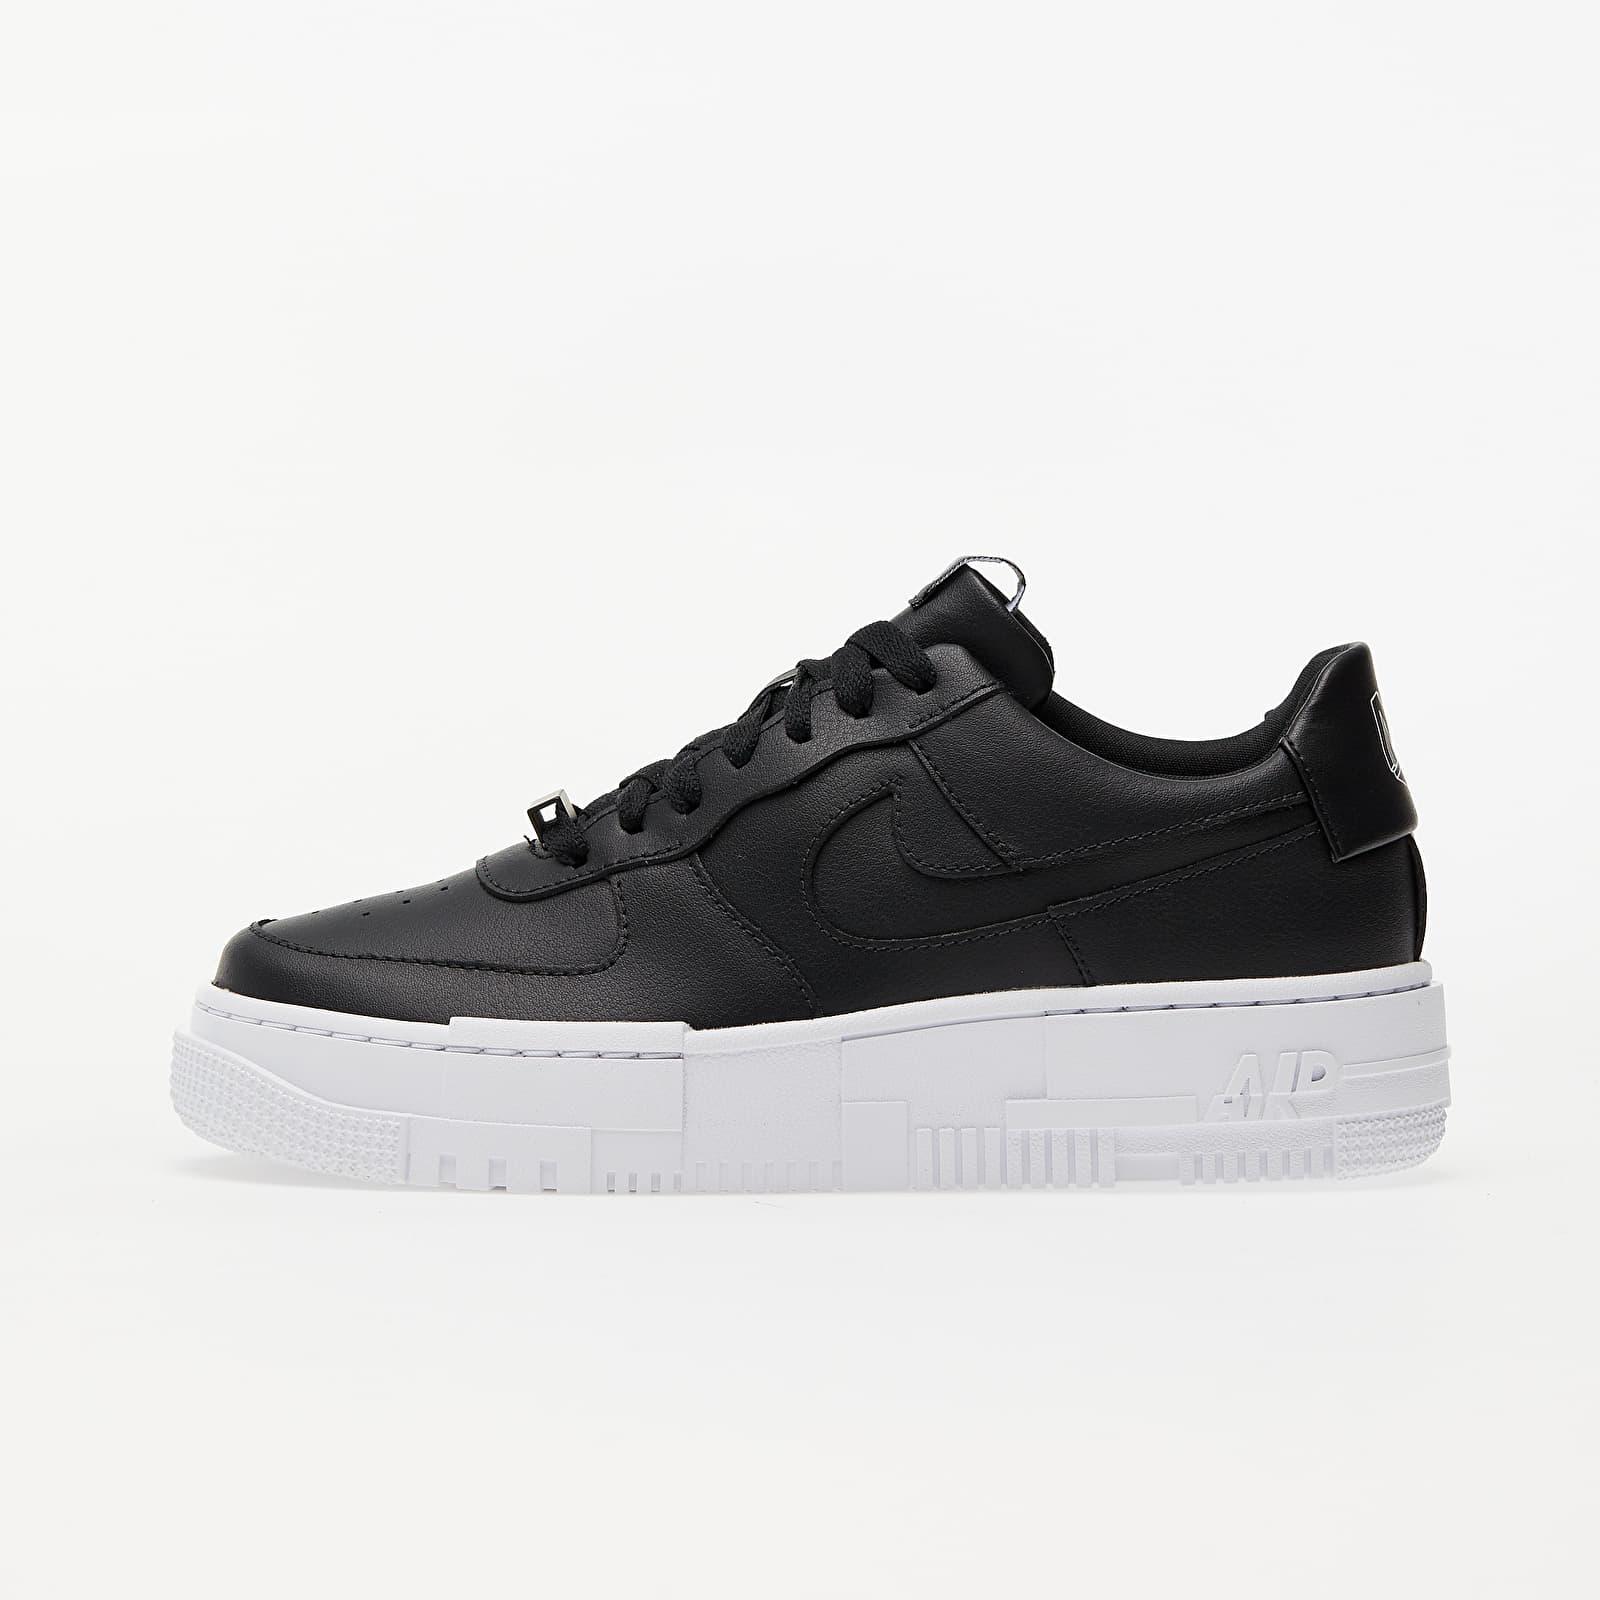 Ženske tenisice Nike W Air Force 1 Pixel Black/ Black-White-Black